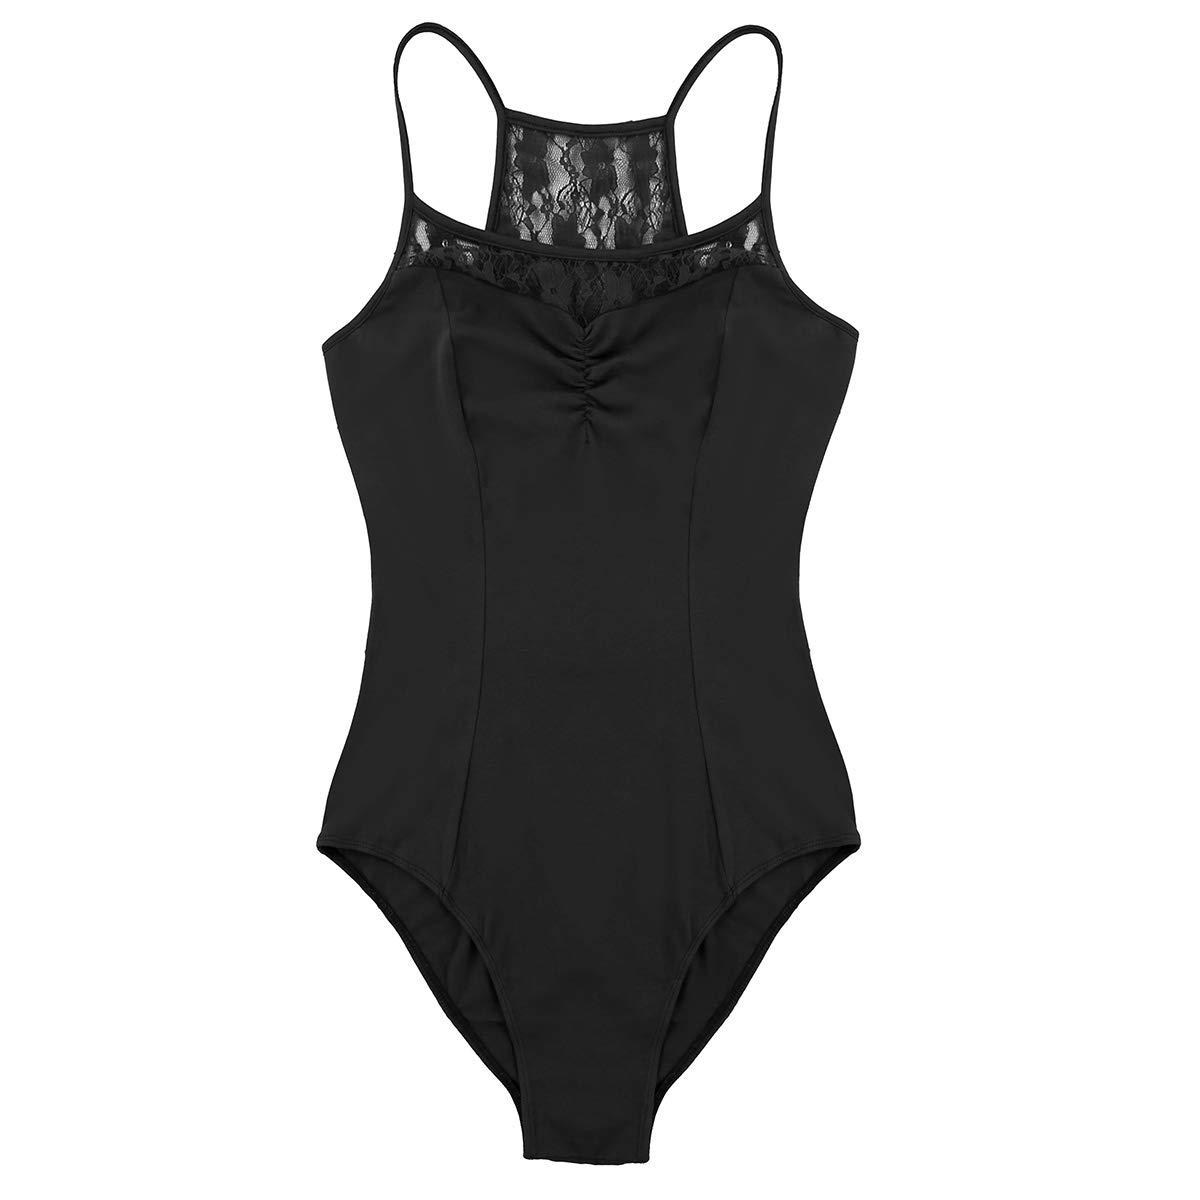 Agoky Womens Spaghetti Straps Criss Cross Back Leotard Built in Shelf Bra Bodysuit Gymnastics Ballet Dancewear